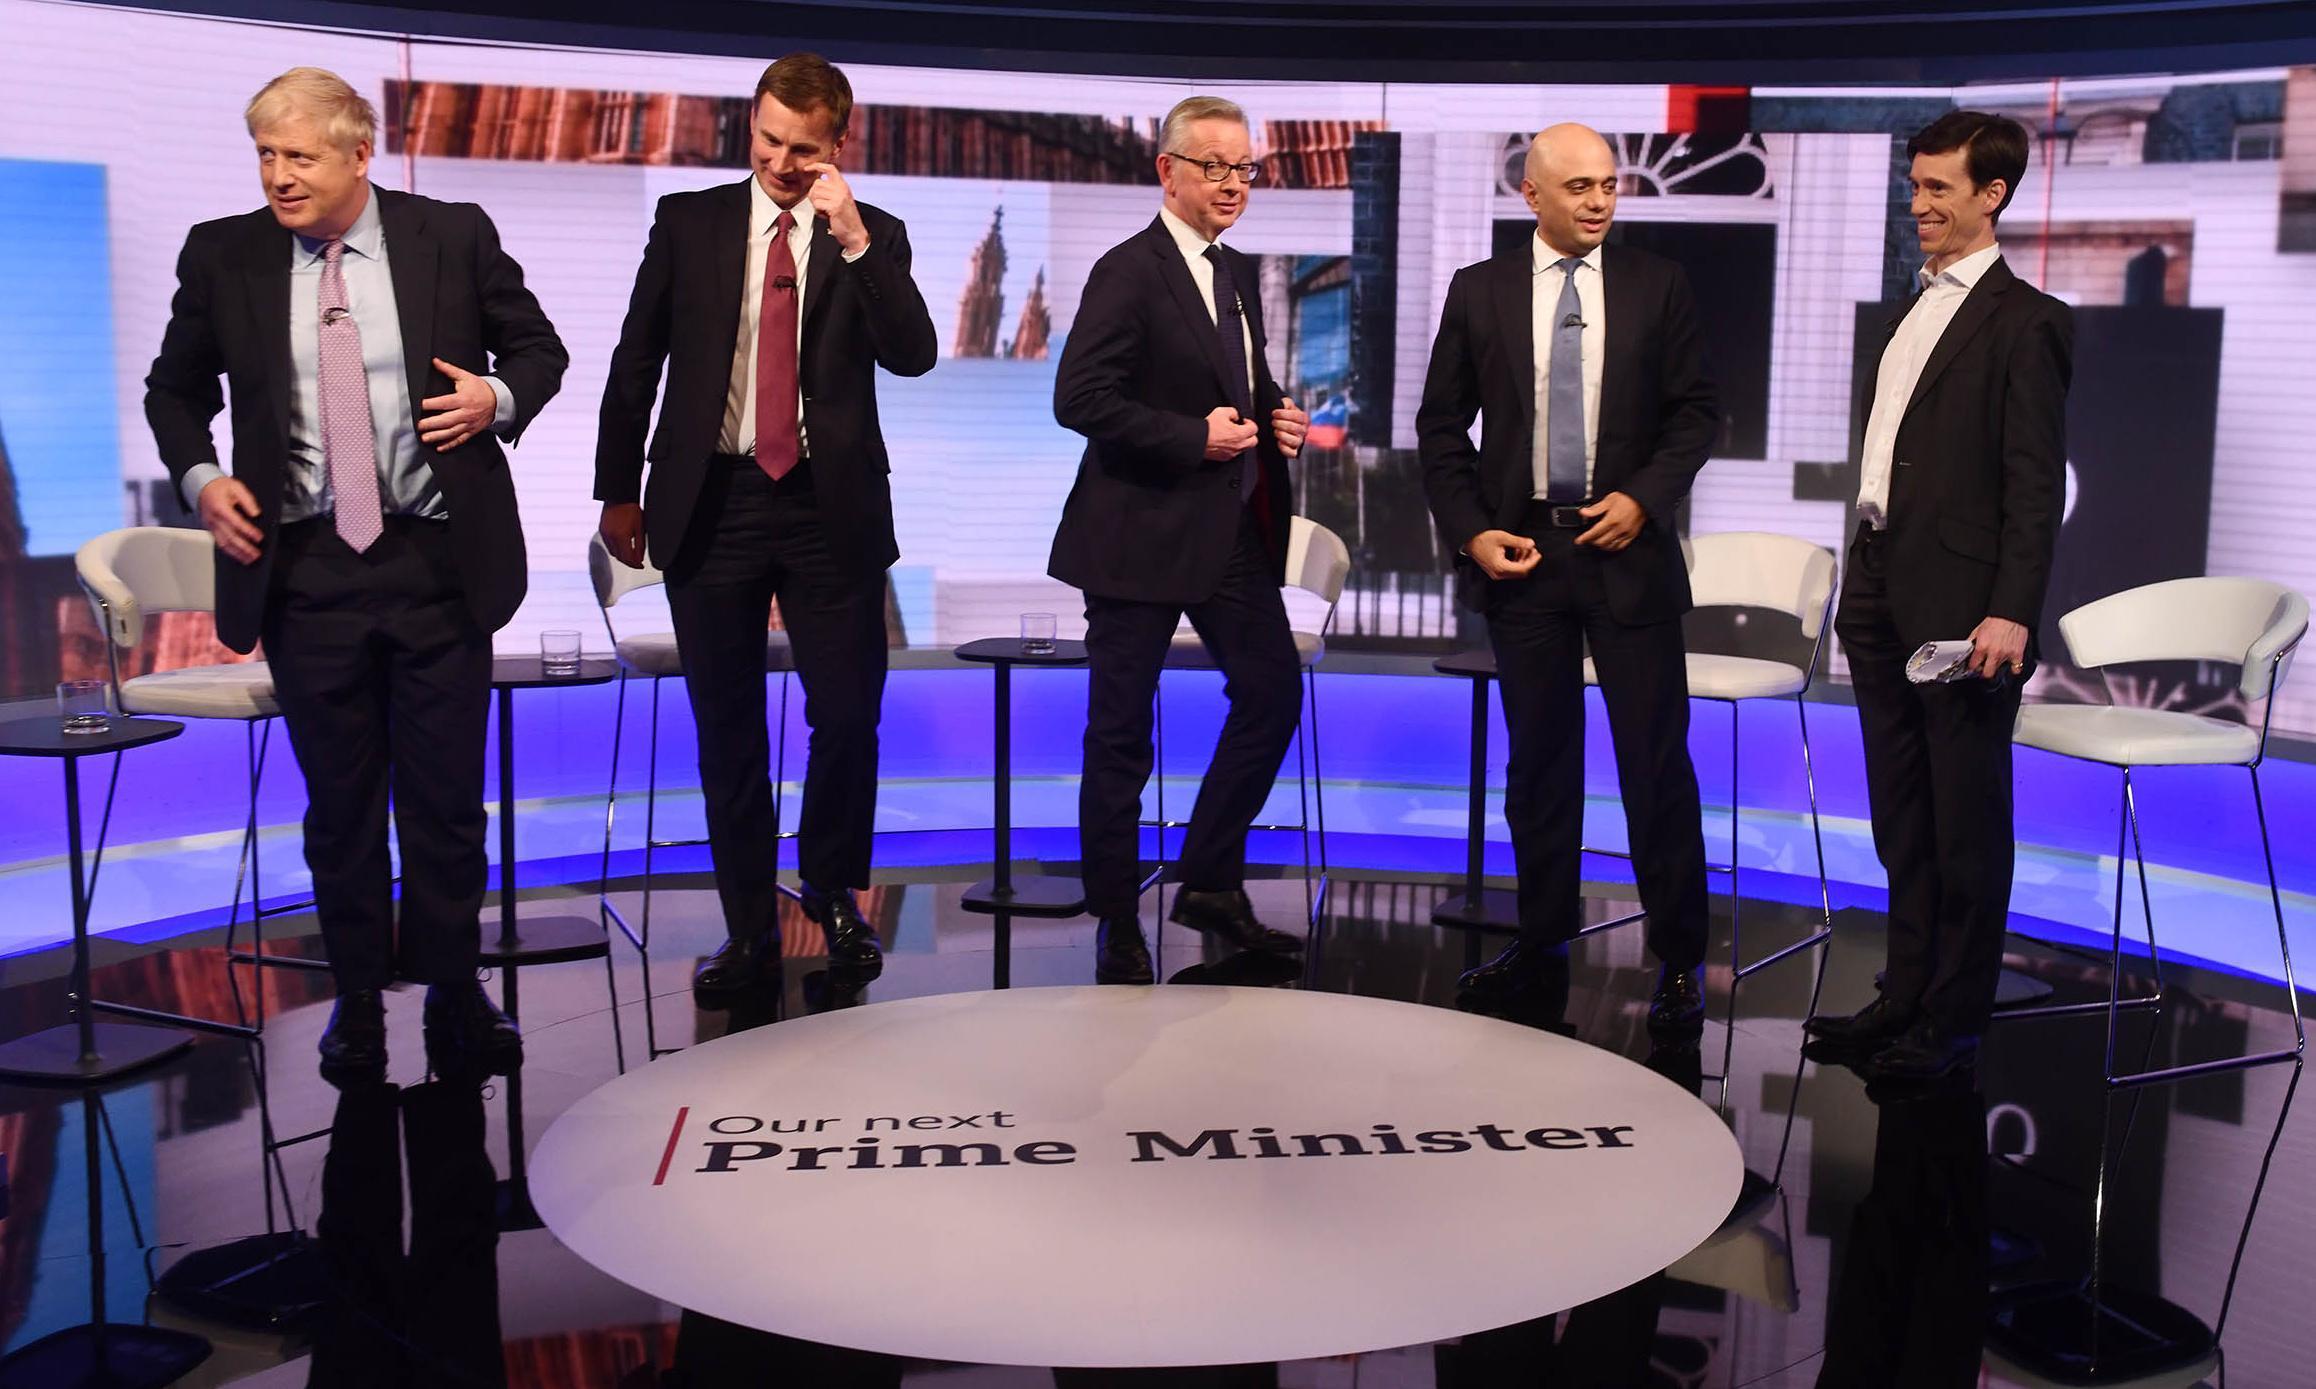 Conservative leadership debate was just embarrassing